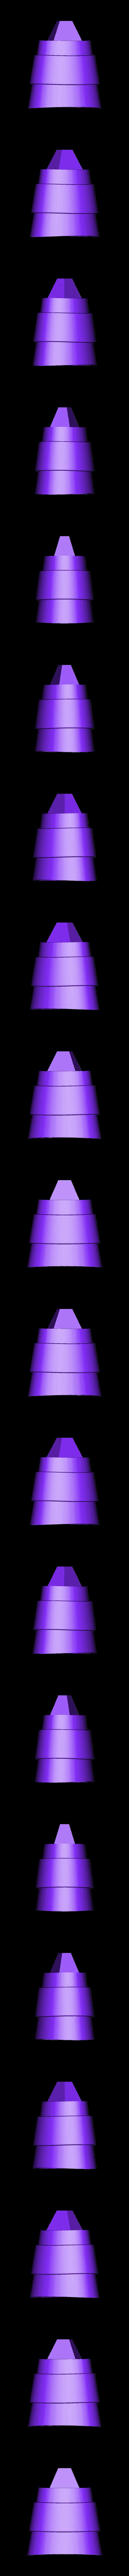 Pink Nana - Body.stl Télécharger fichier STL Super Nana Totem • Design imprimable en 3D, BODY3D